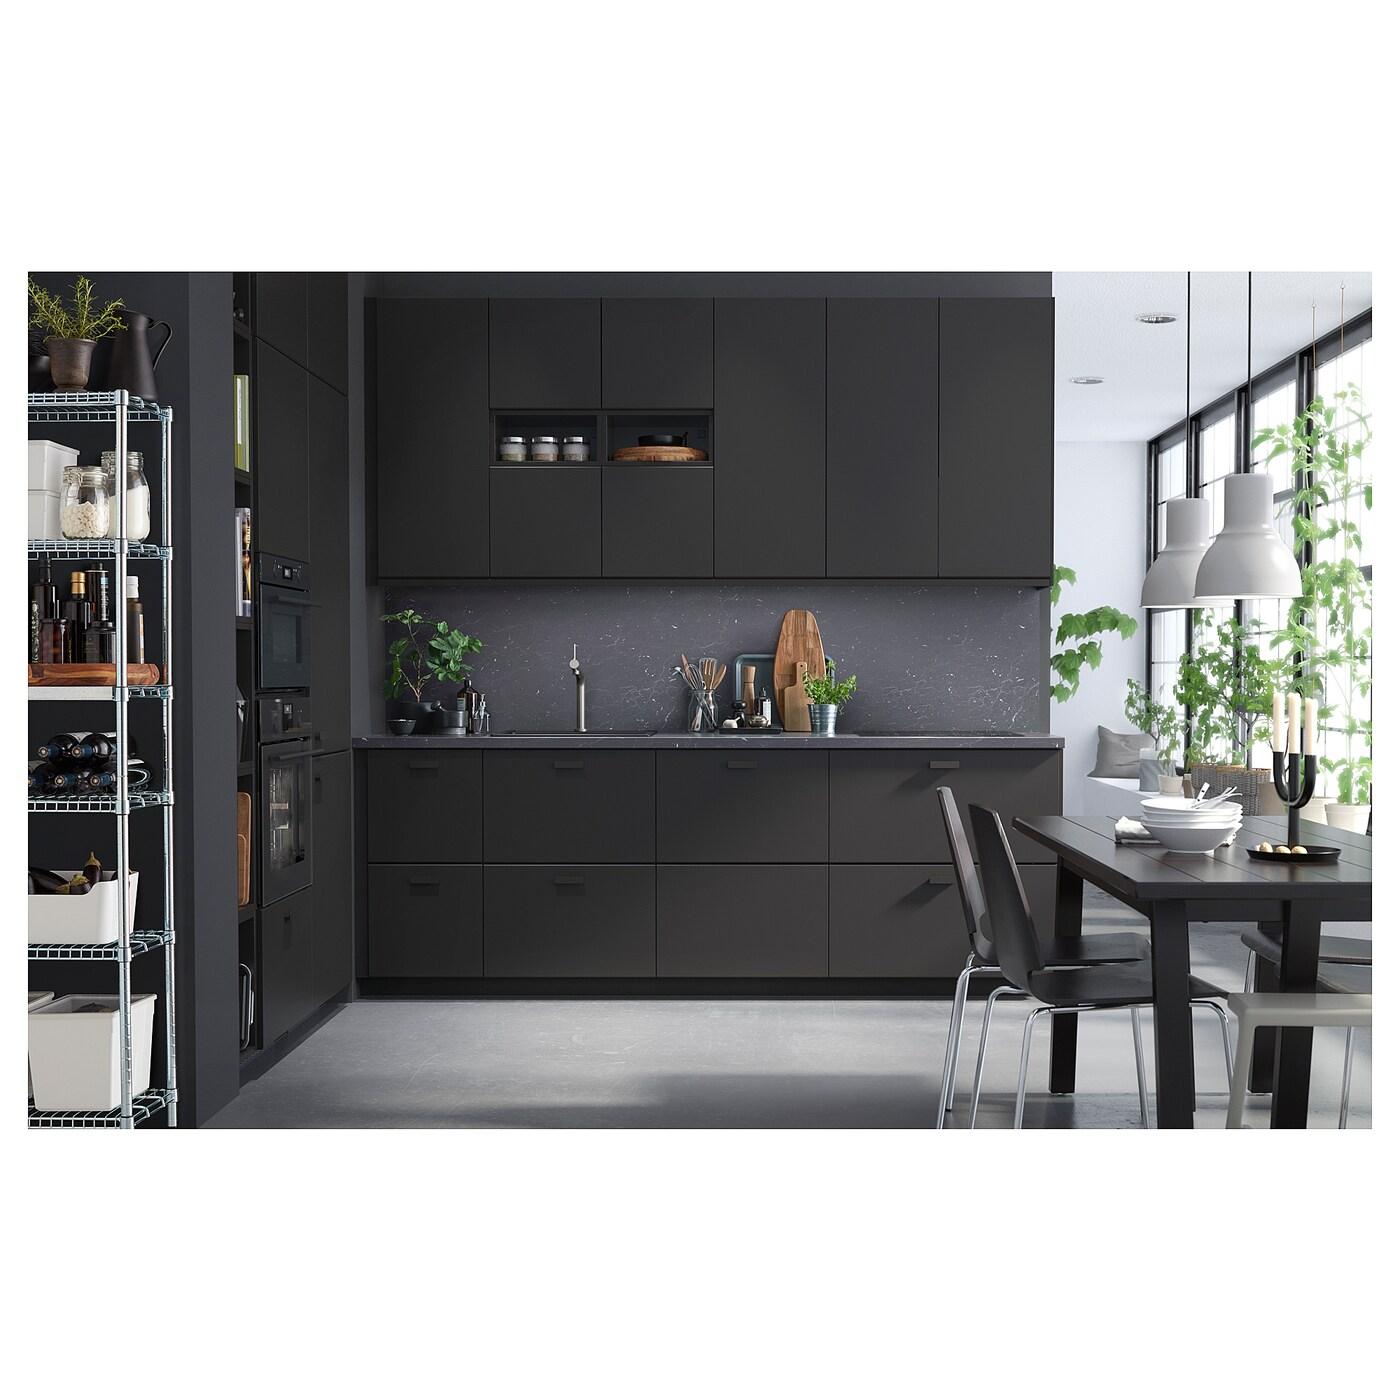 s ljan plan de travail noir marbr 186 x 3 8 cm ikea. Black Bedroom Furniture Sets. Home Design Ideas